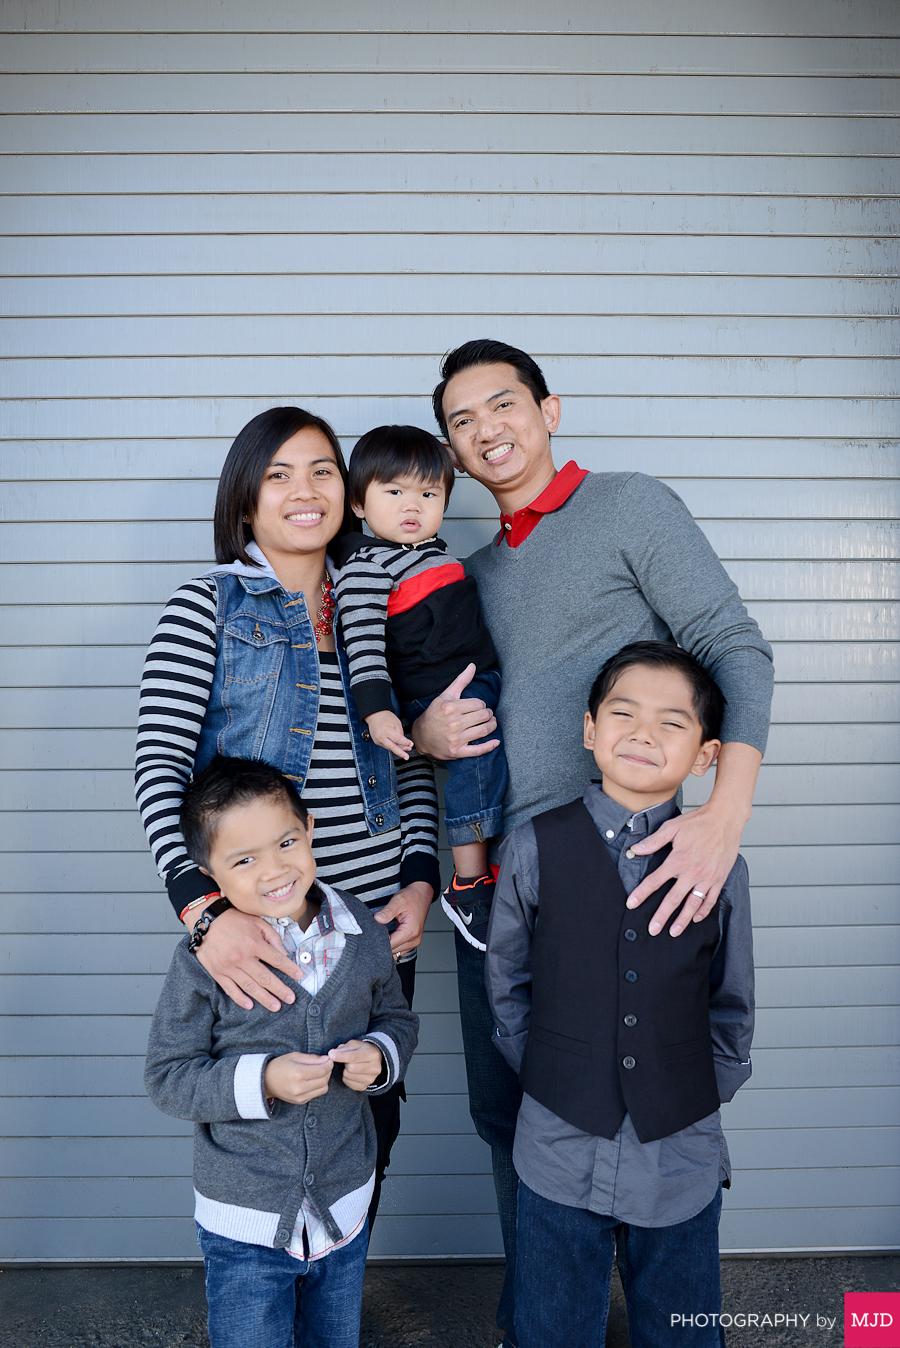 Gatchalian_Family_Web-1.jpg